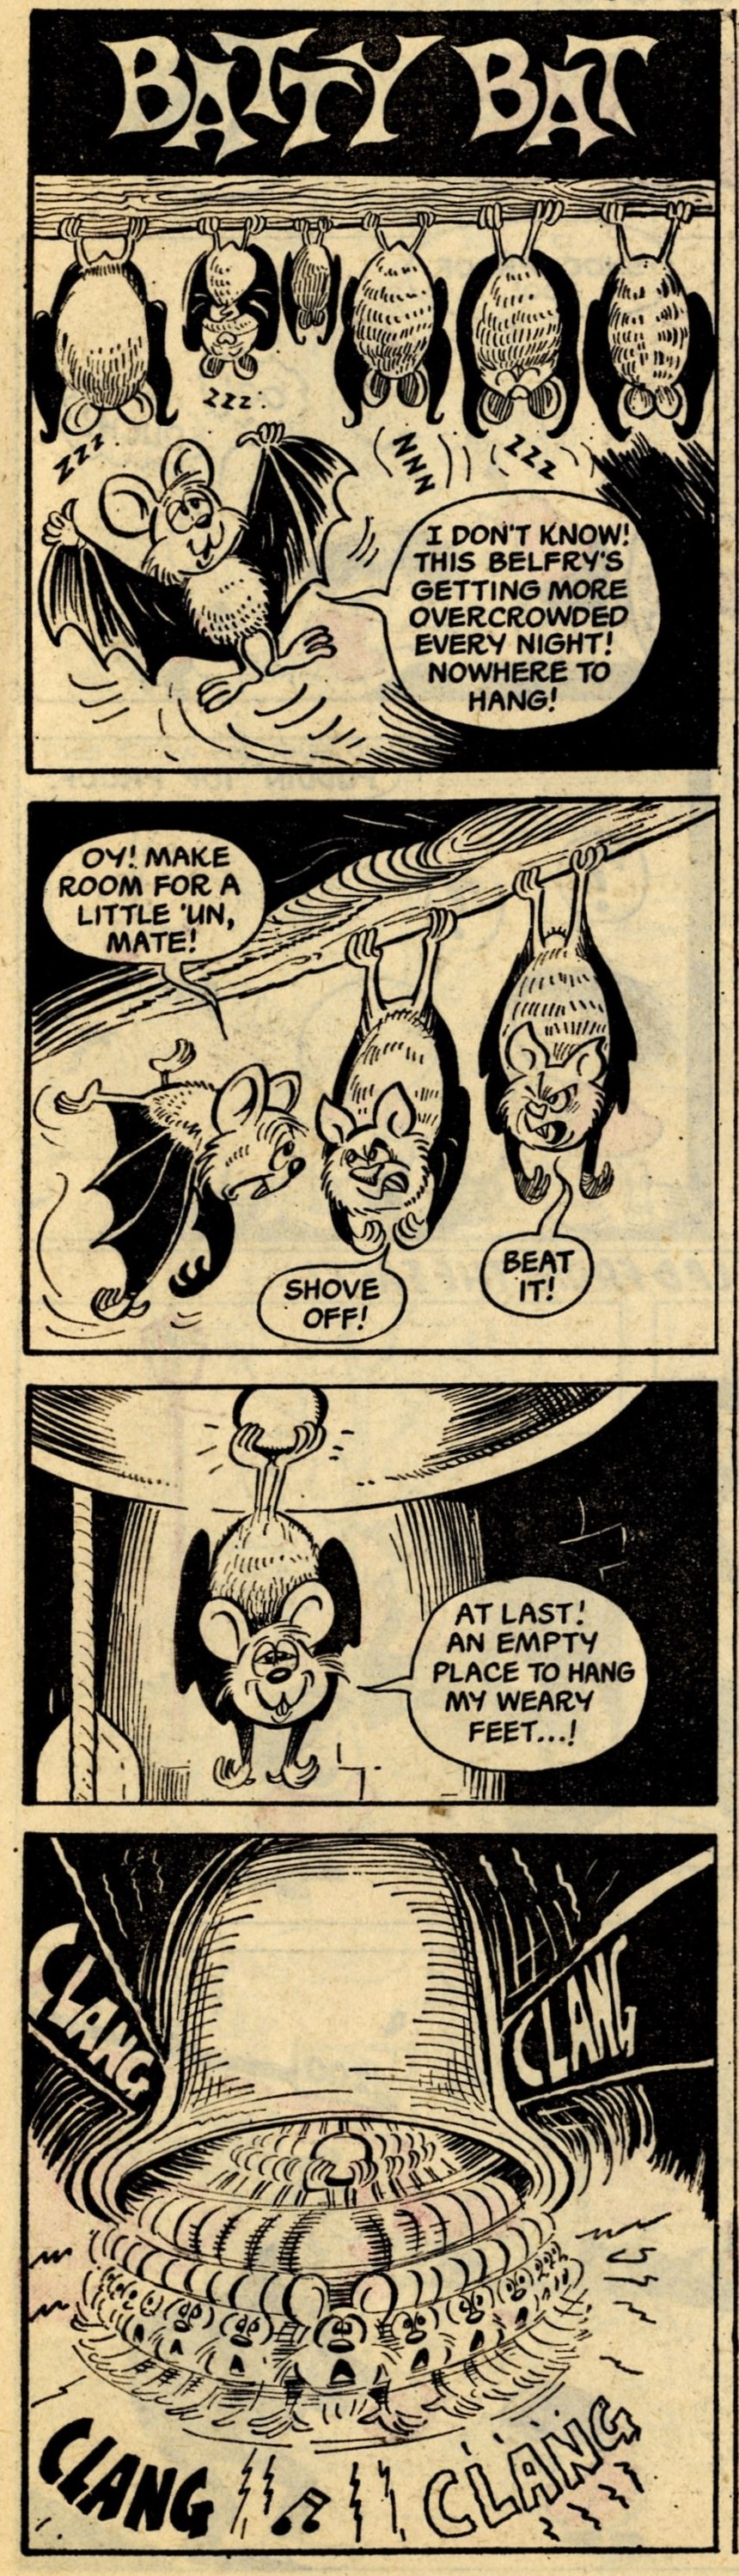 Batty Bat: Joseph Lee (artist)